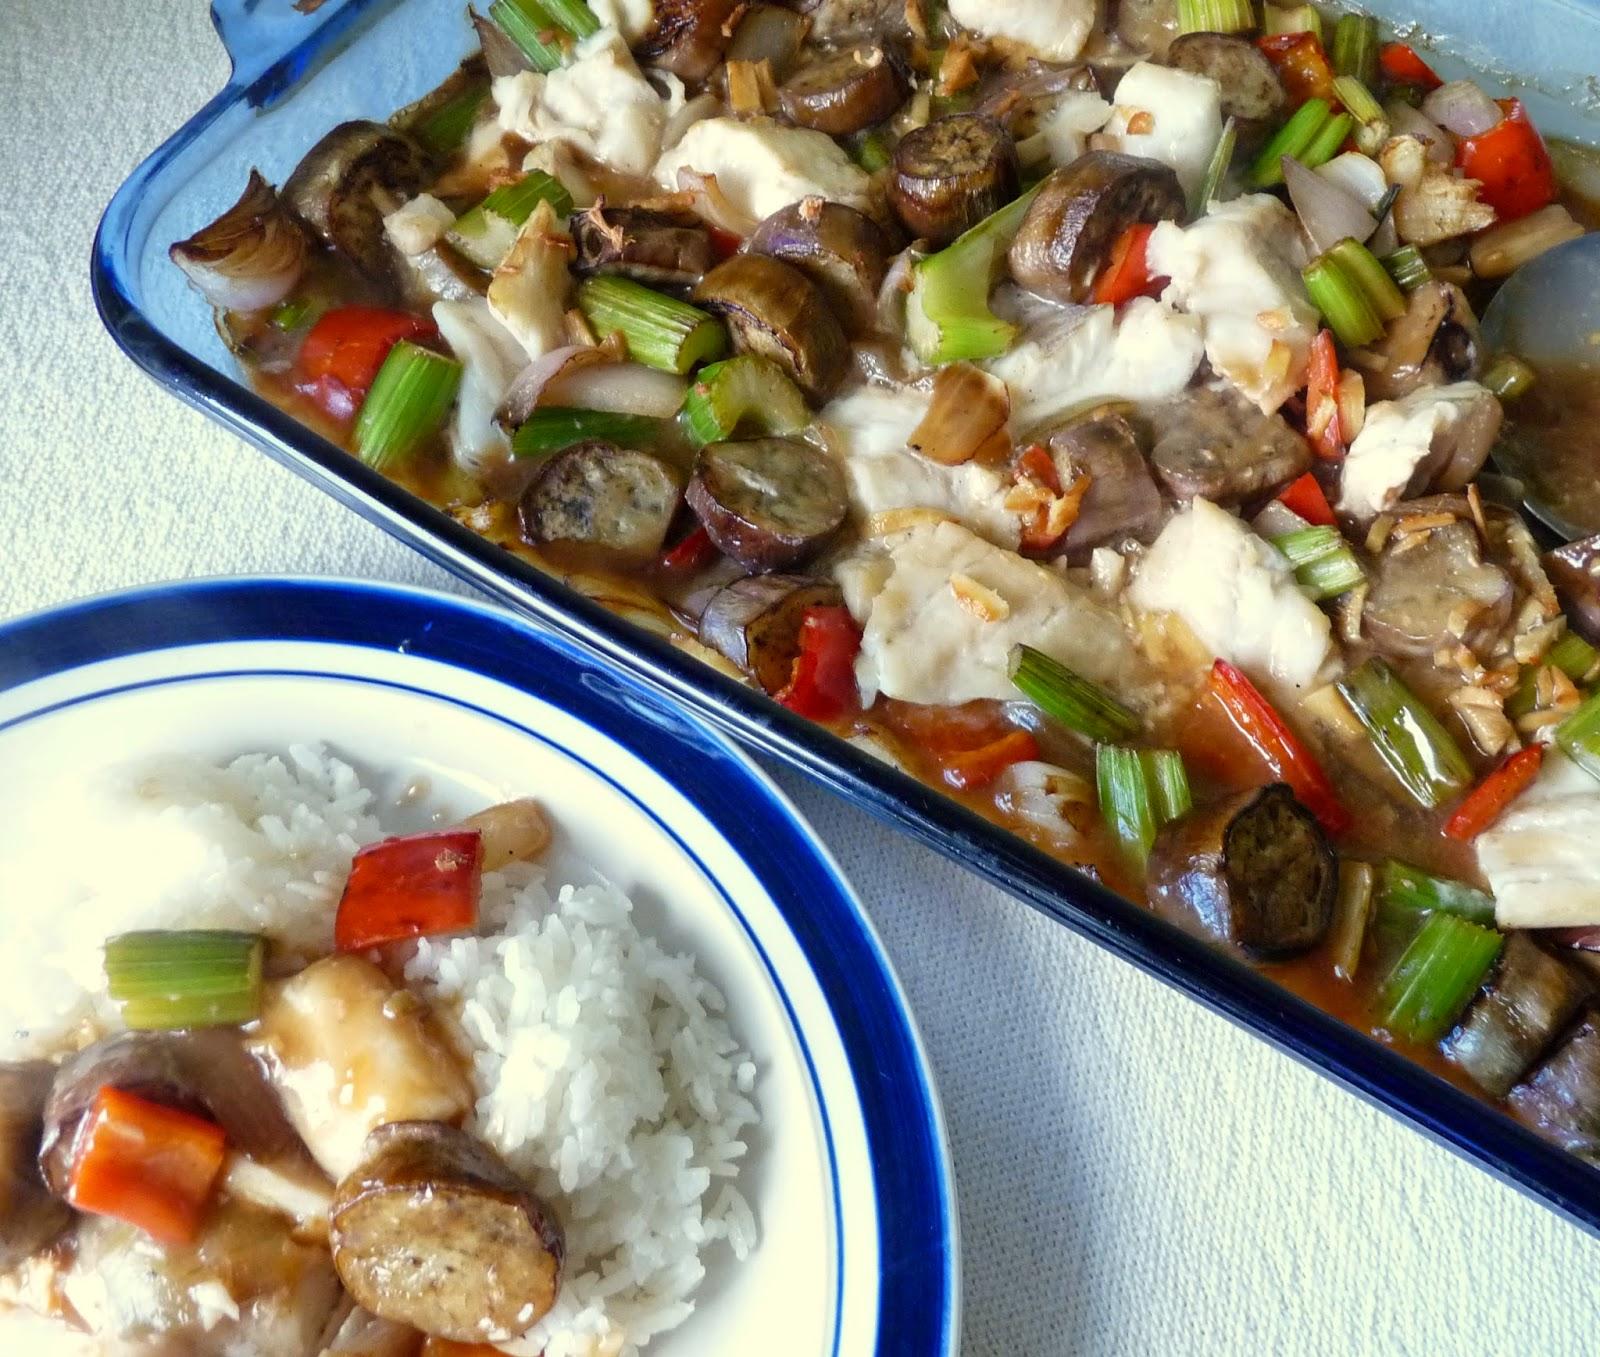 Fish & Eggplant Casserole